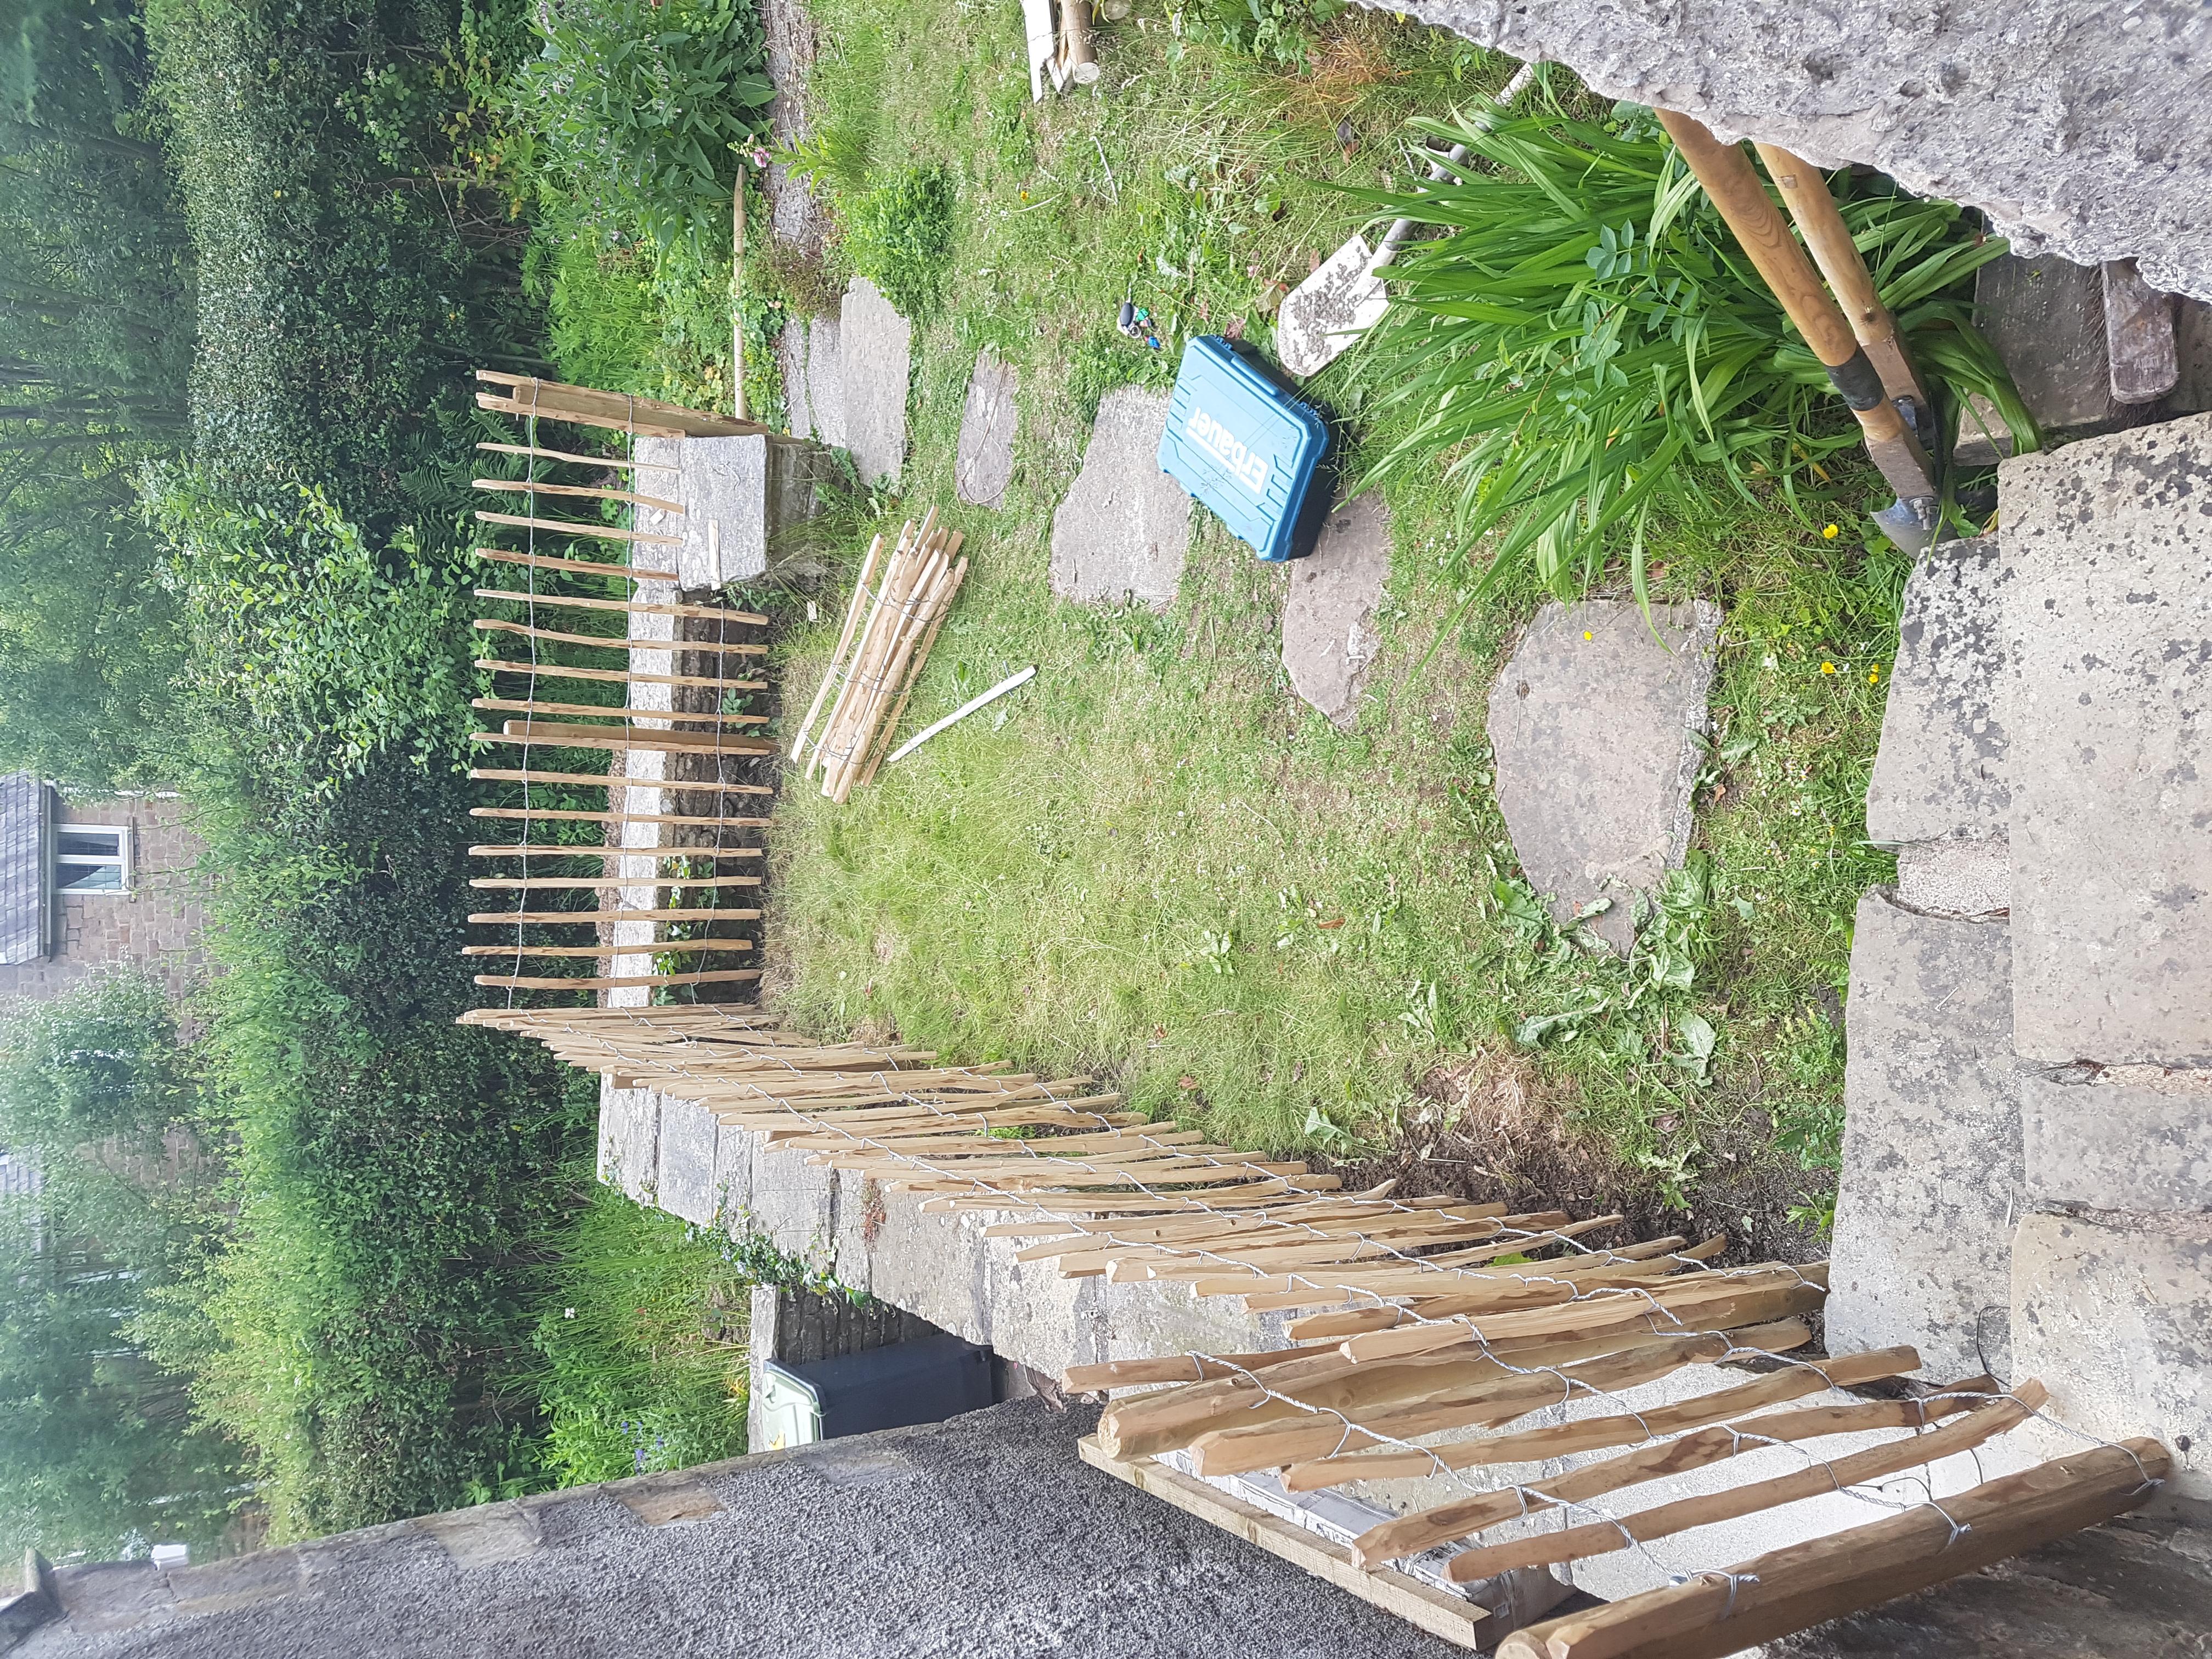 chestnut paling fence.jpg